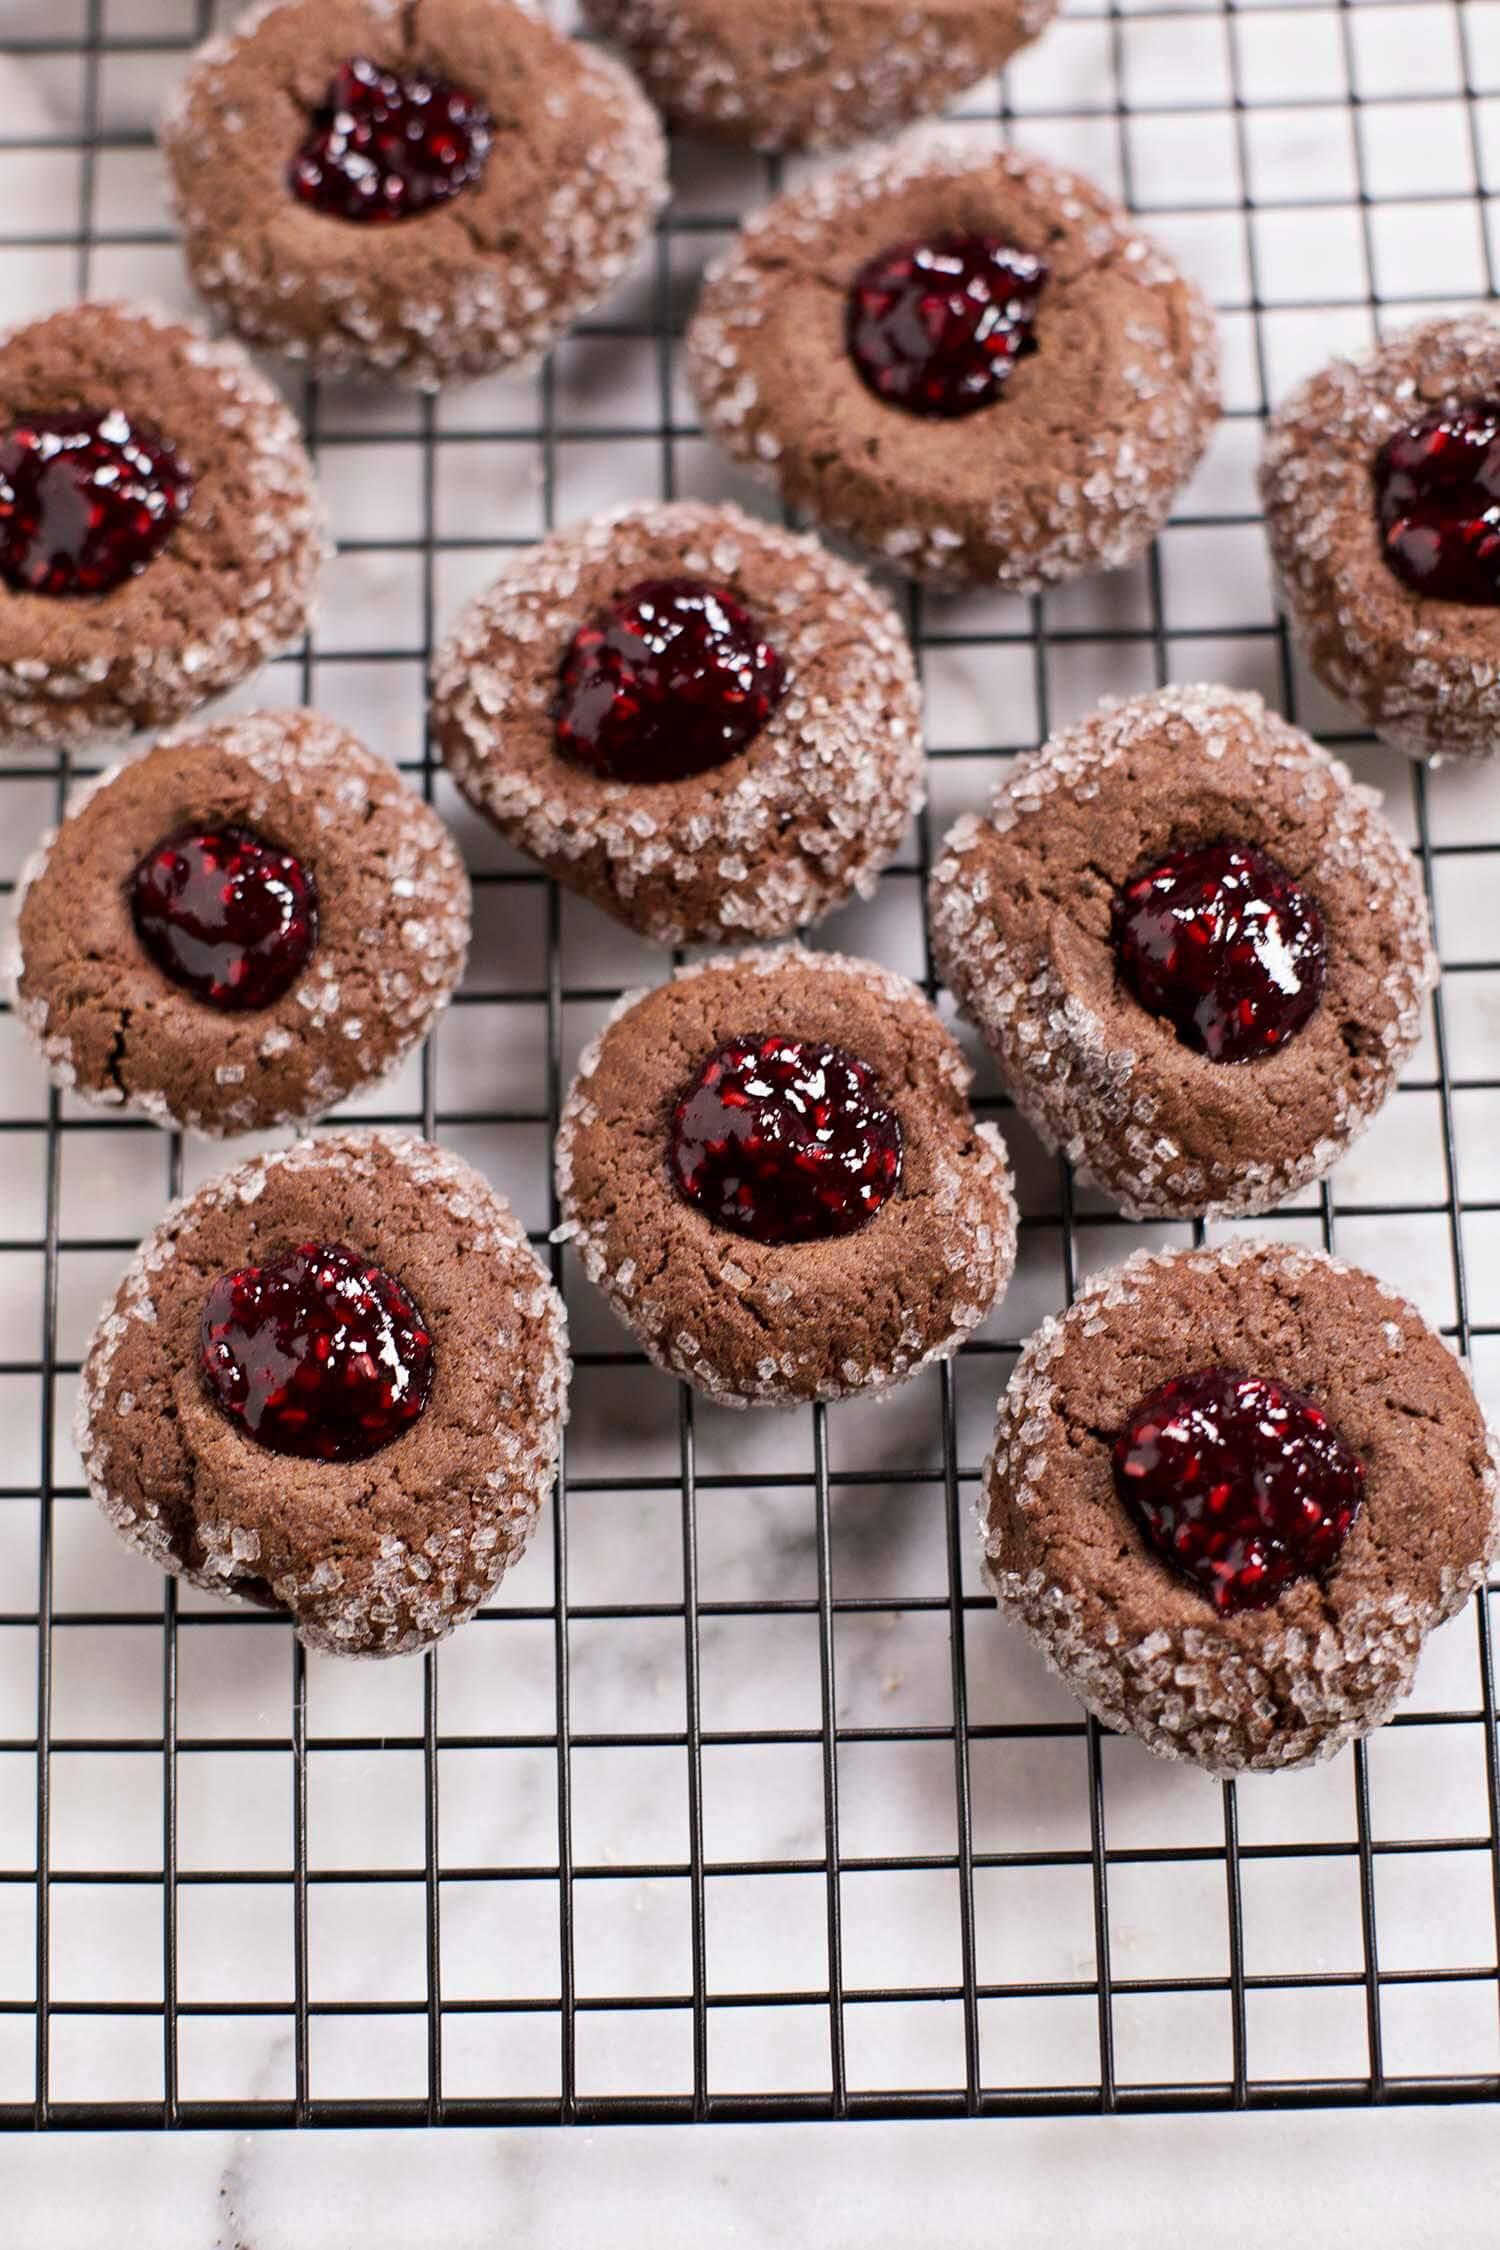 Chocolate thumbprint cookies with red wine raspberry jam (via abeautifulmess.com)